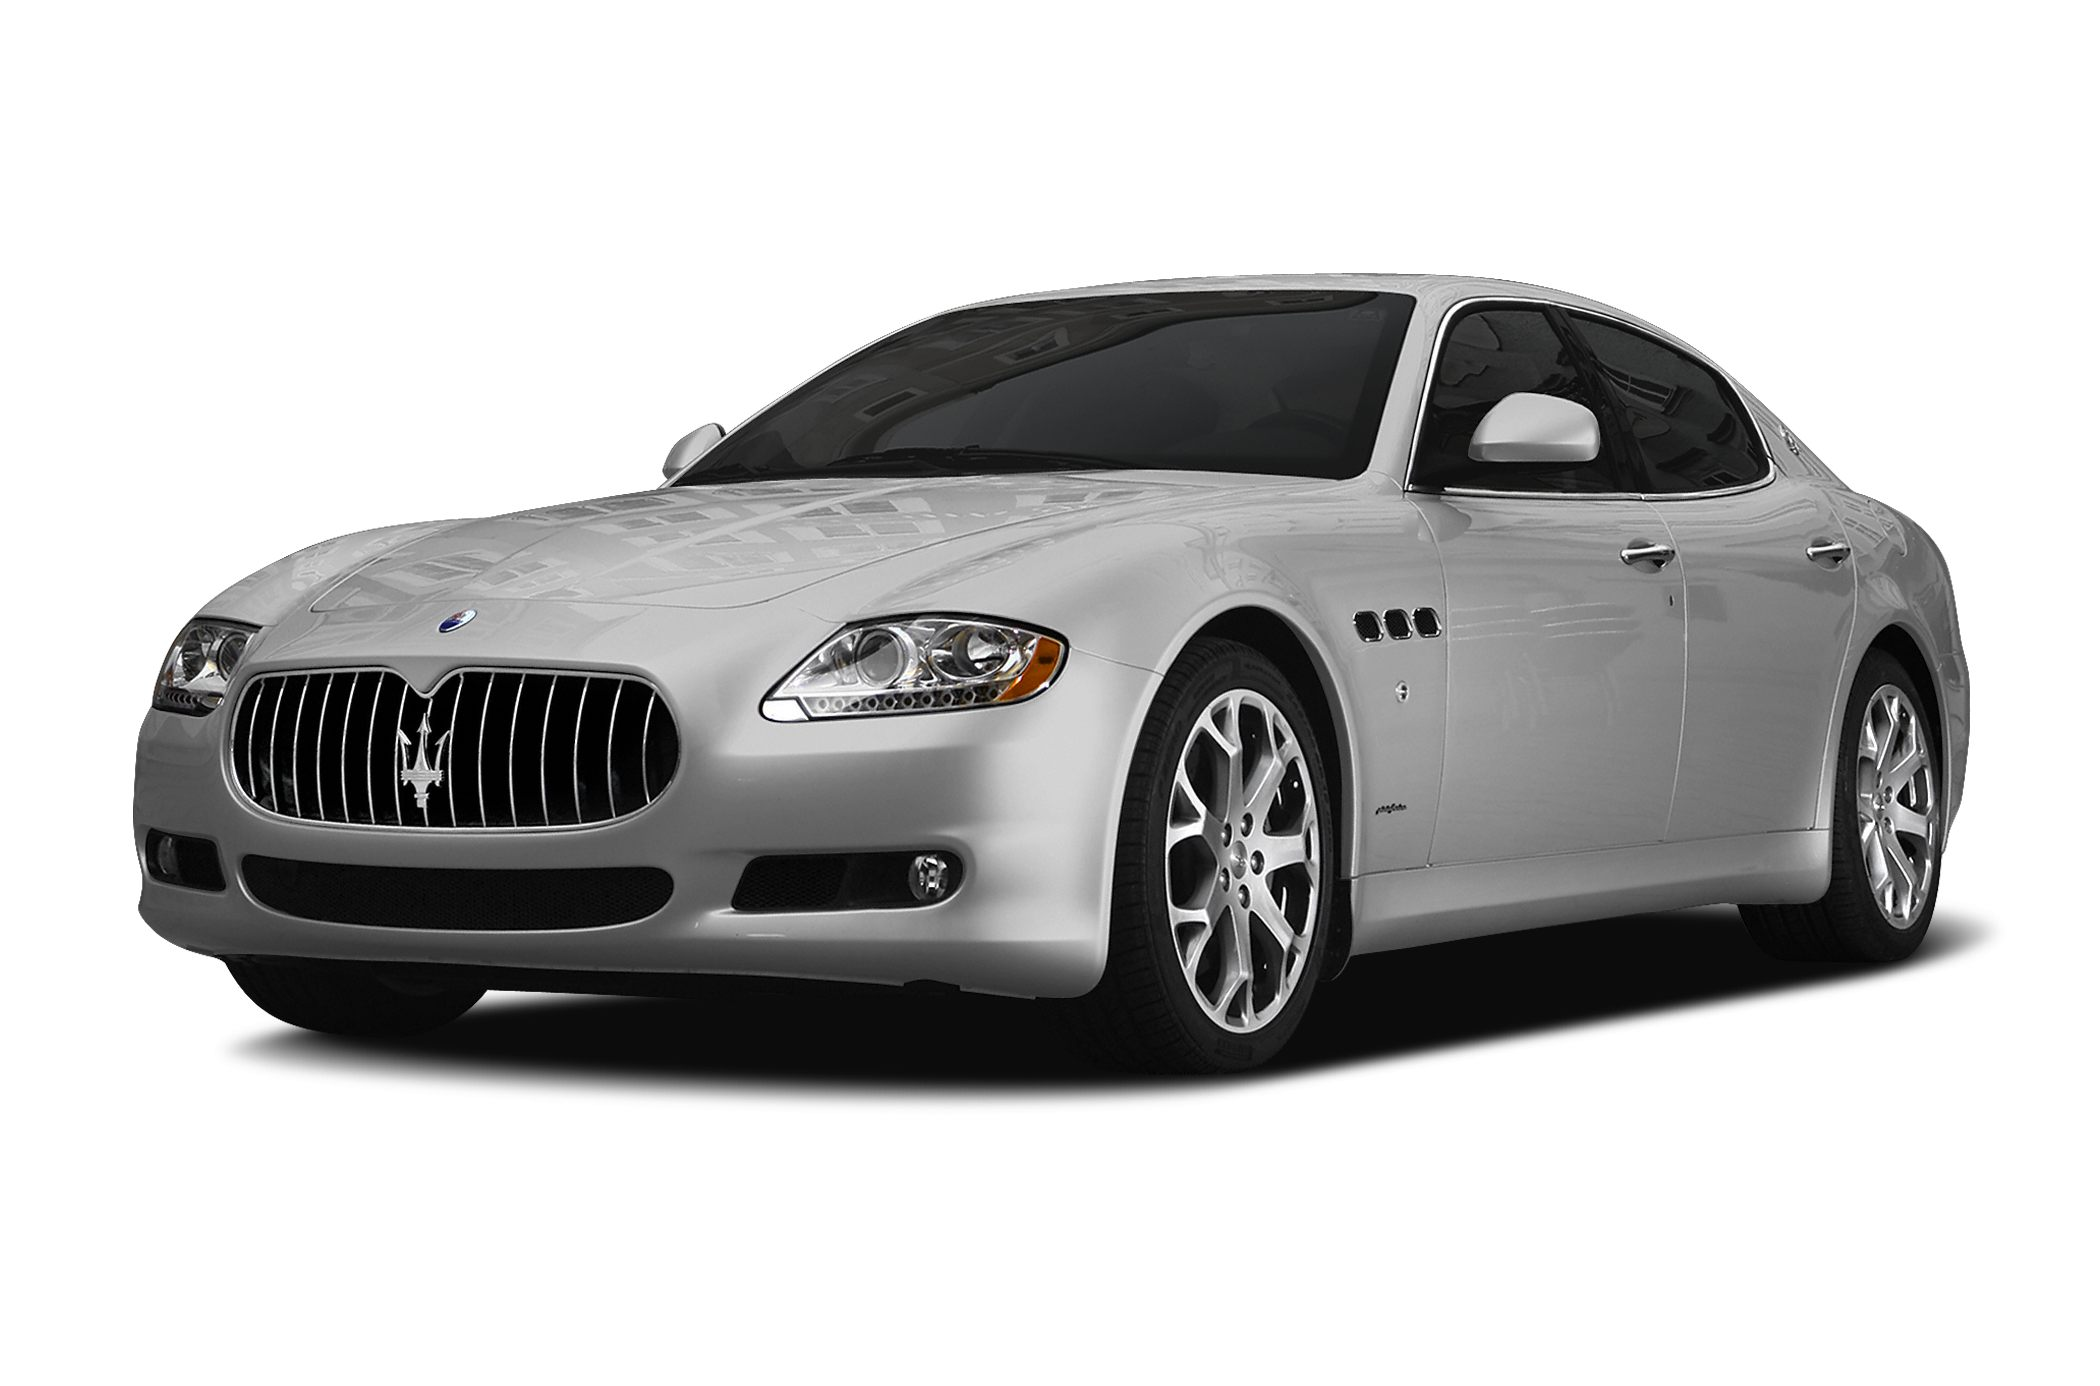 2009 Maserati Quattroporte Safety Recalls